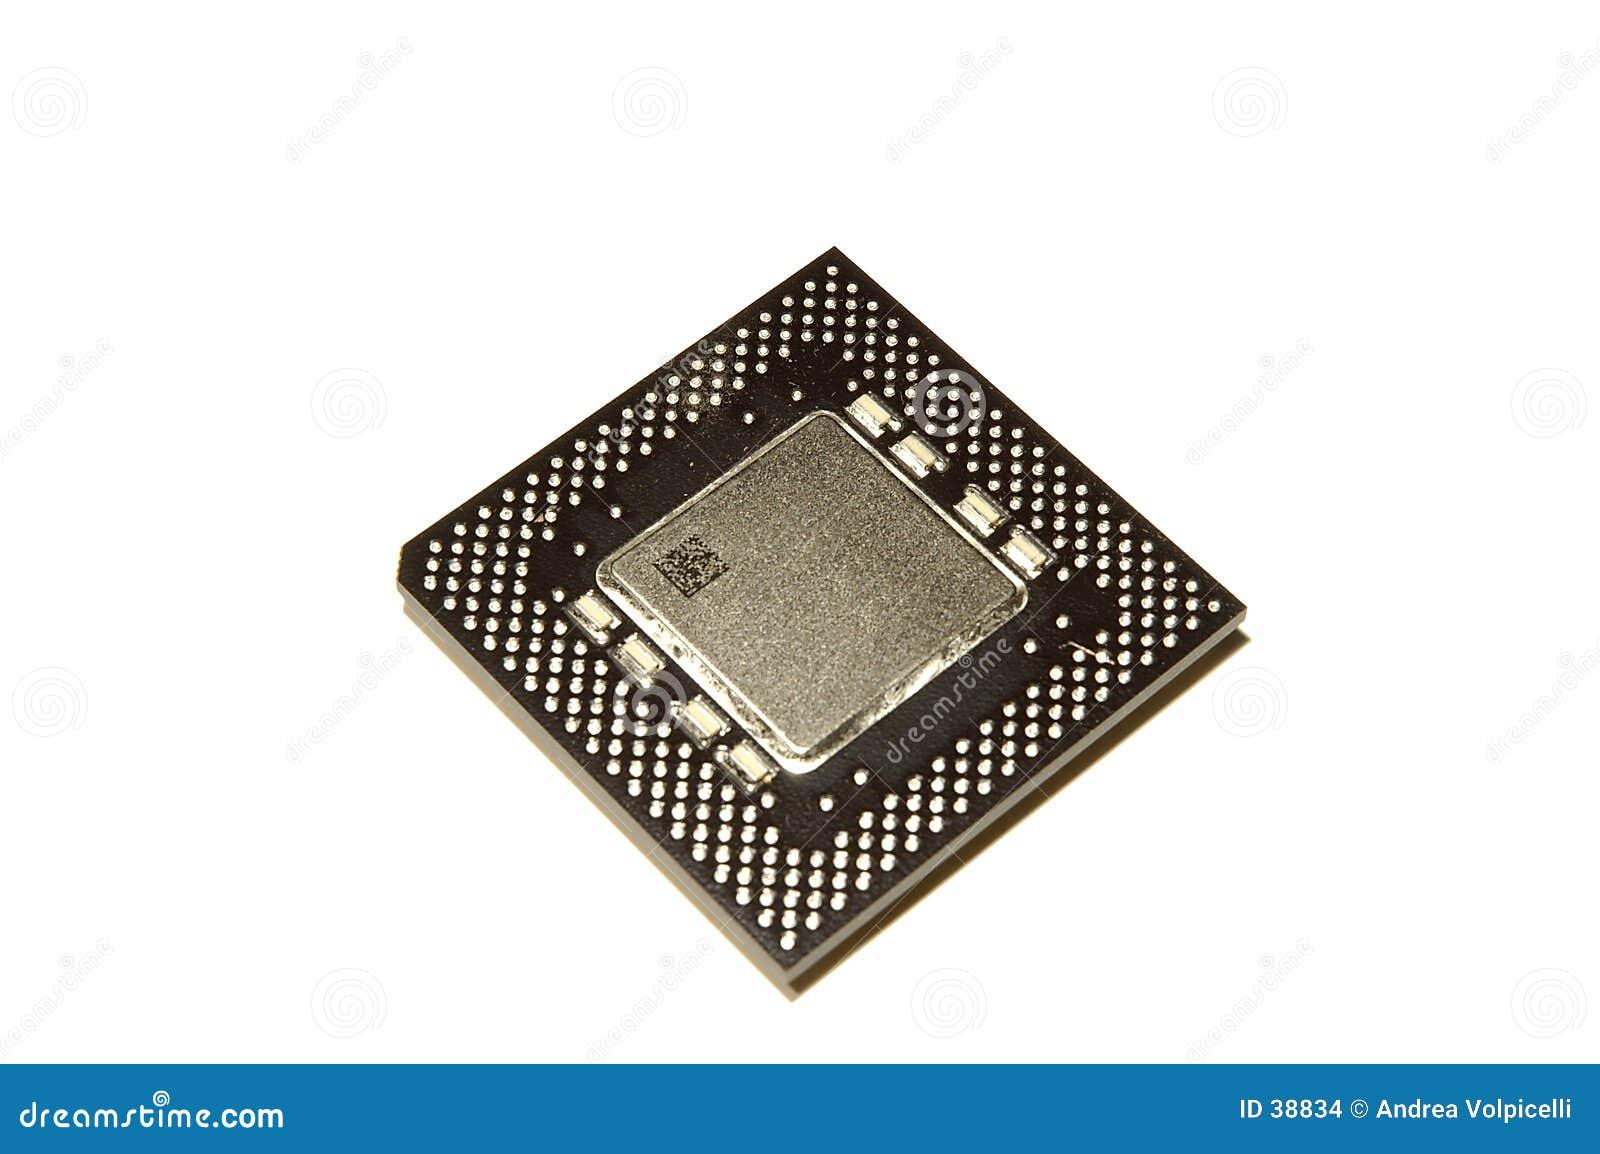 CPU 02